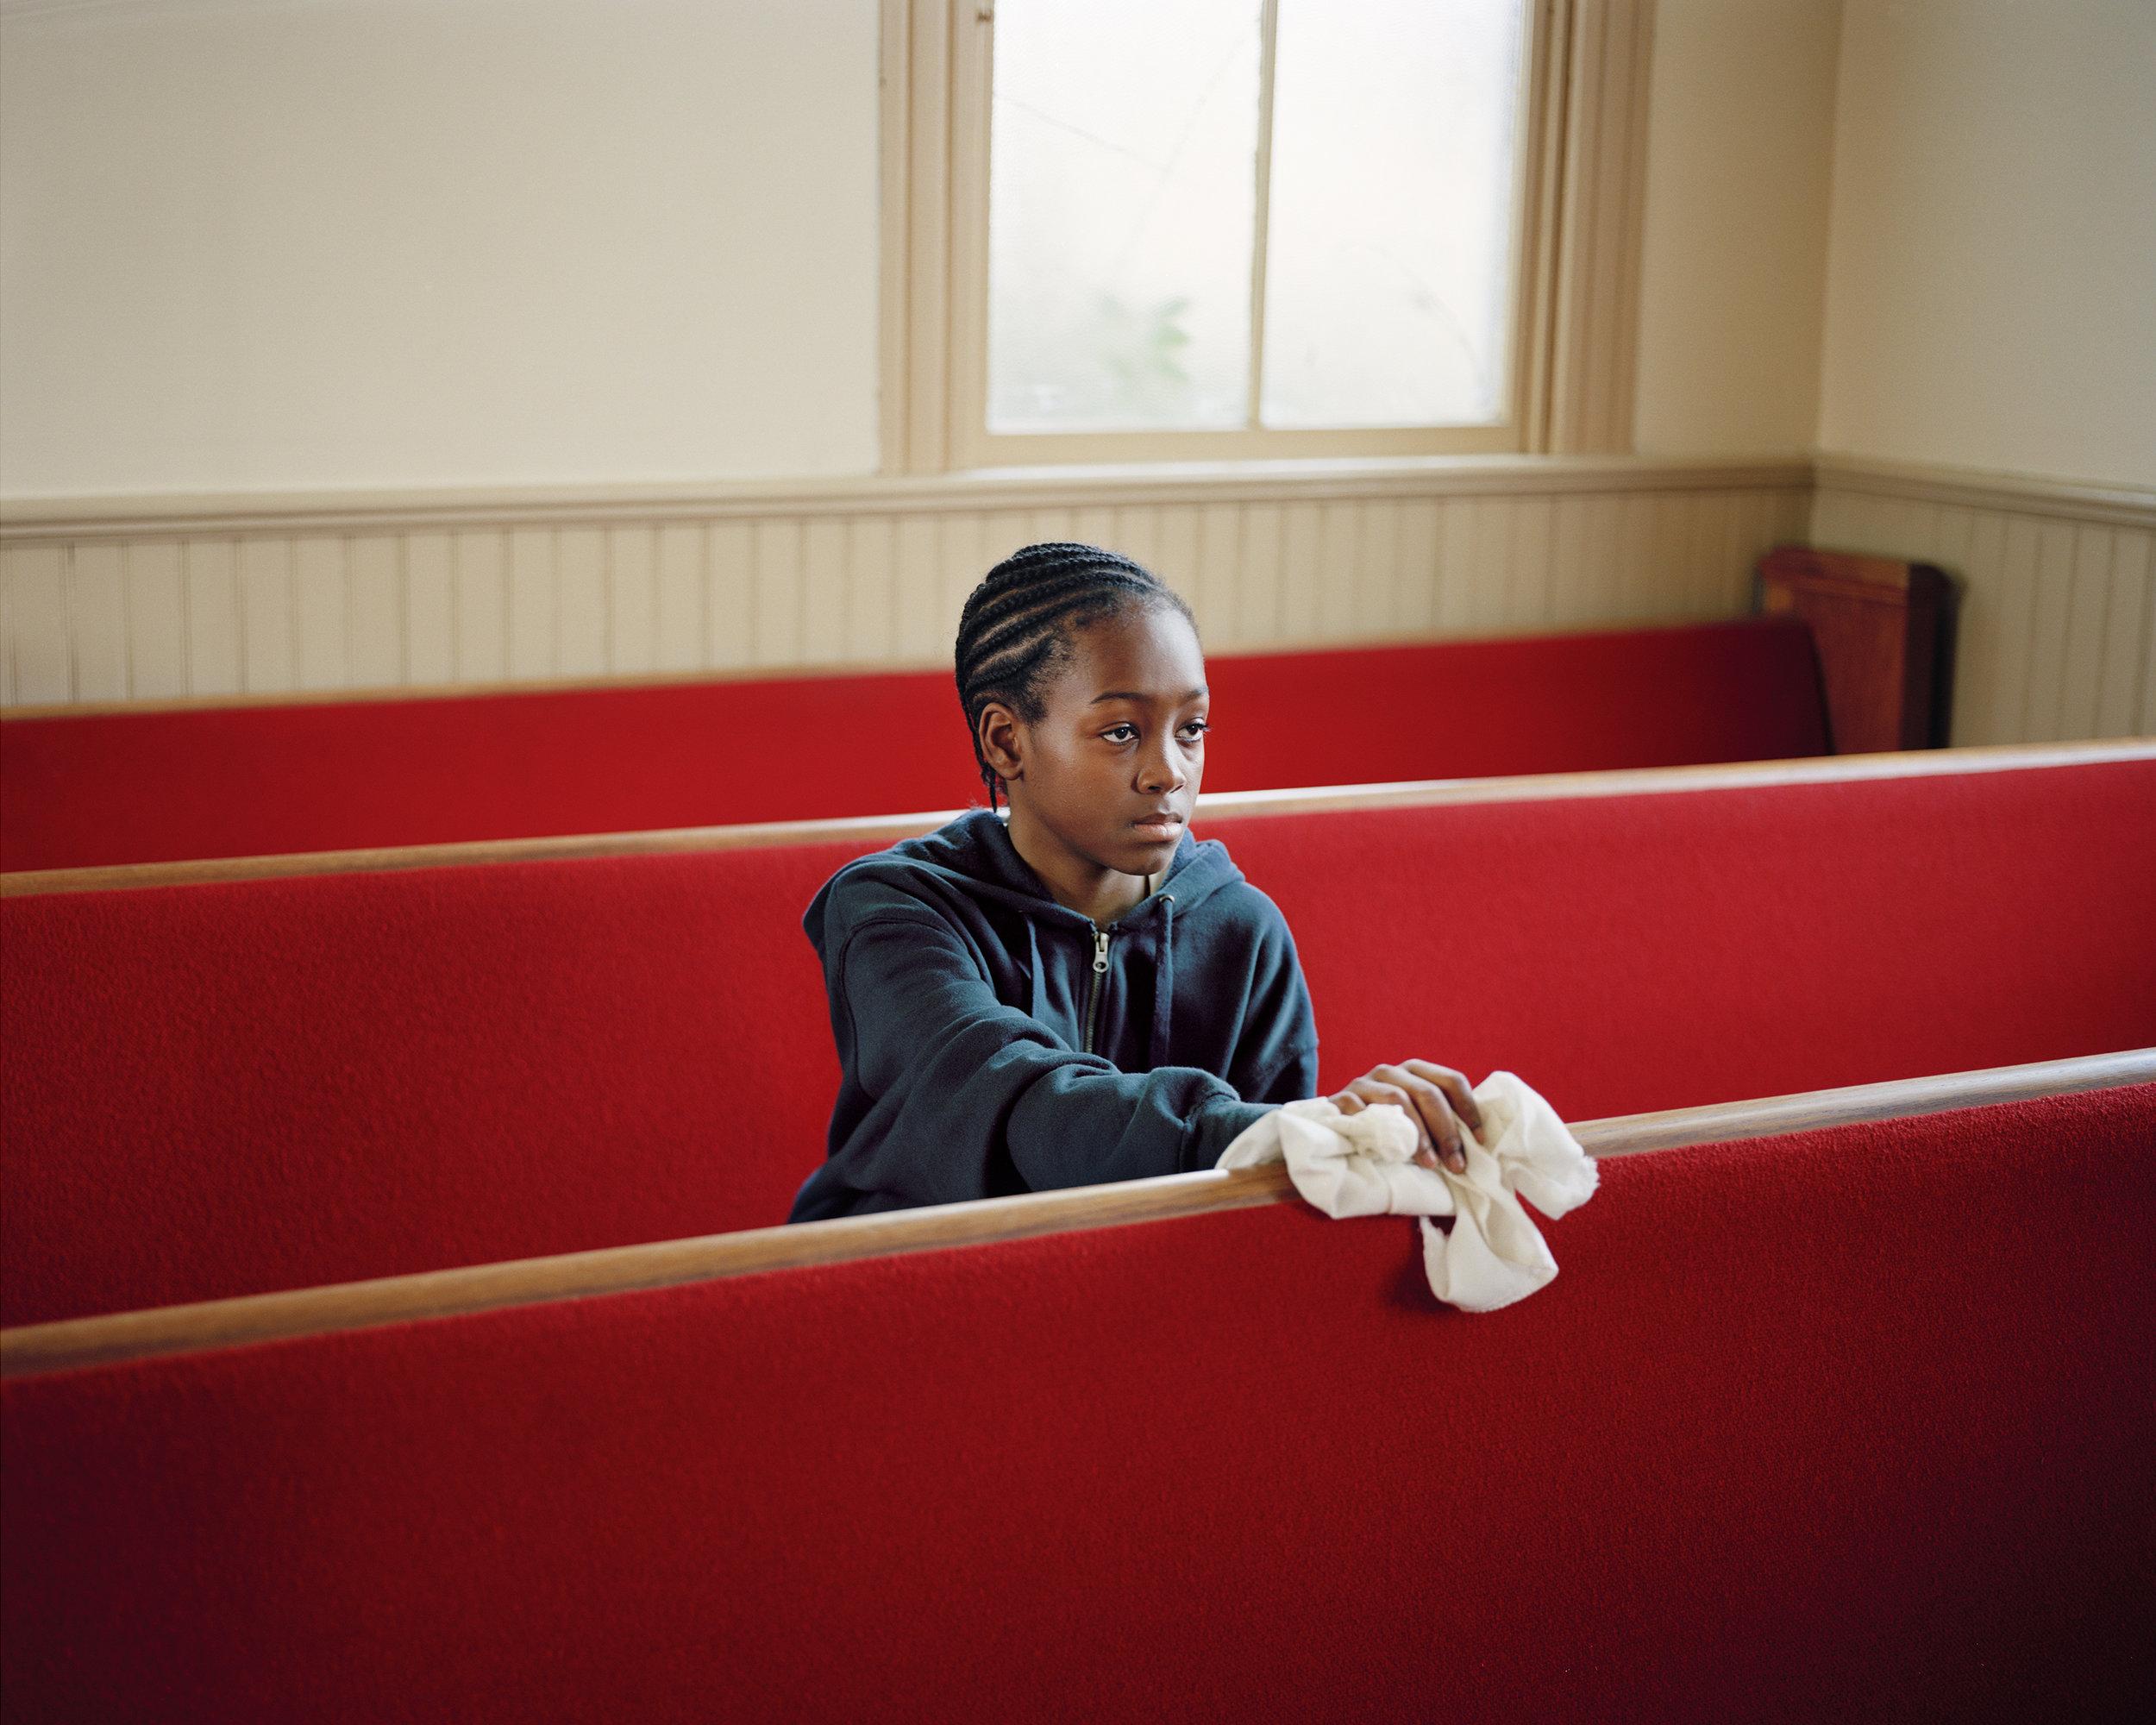 Young Boy Cleaning Church, VA,